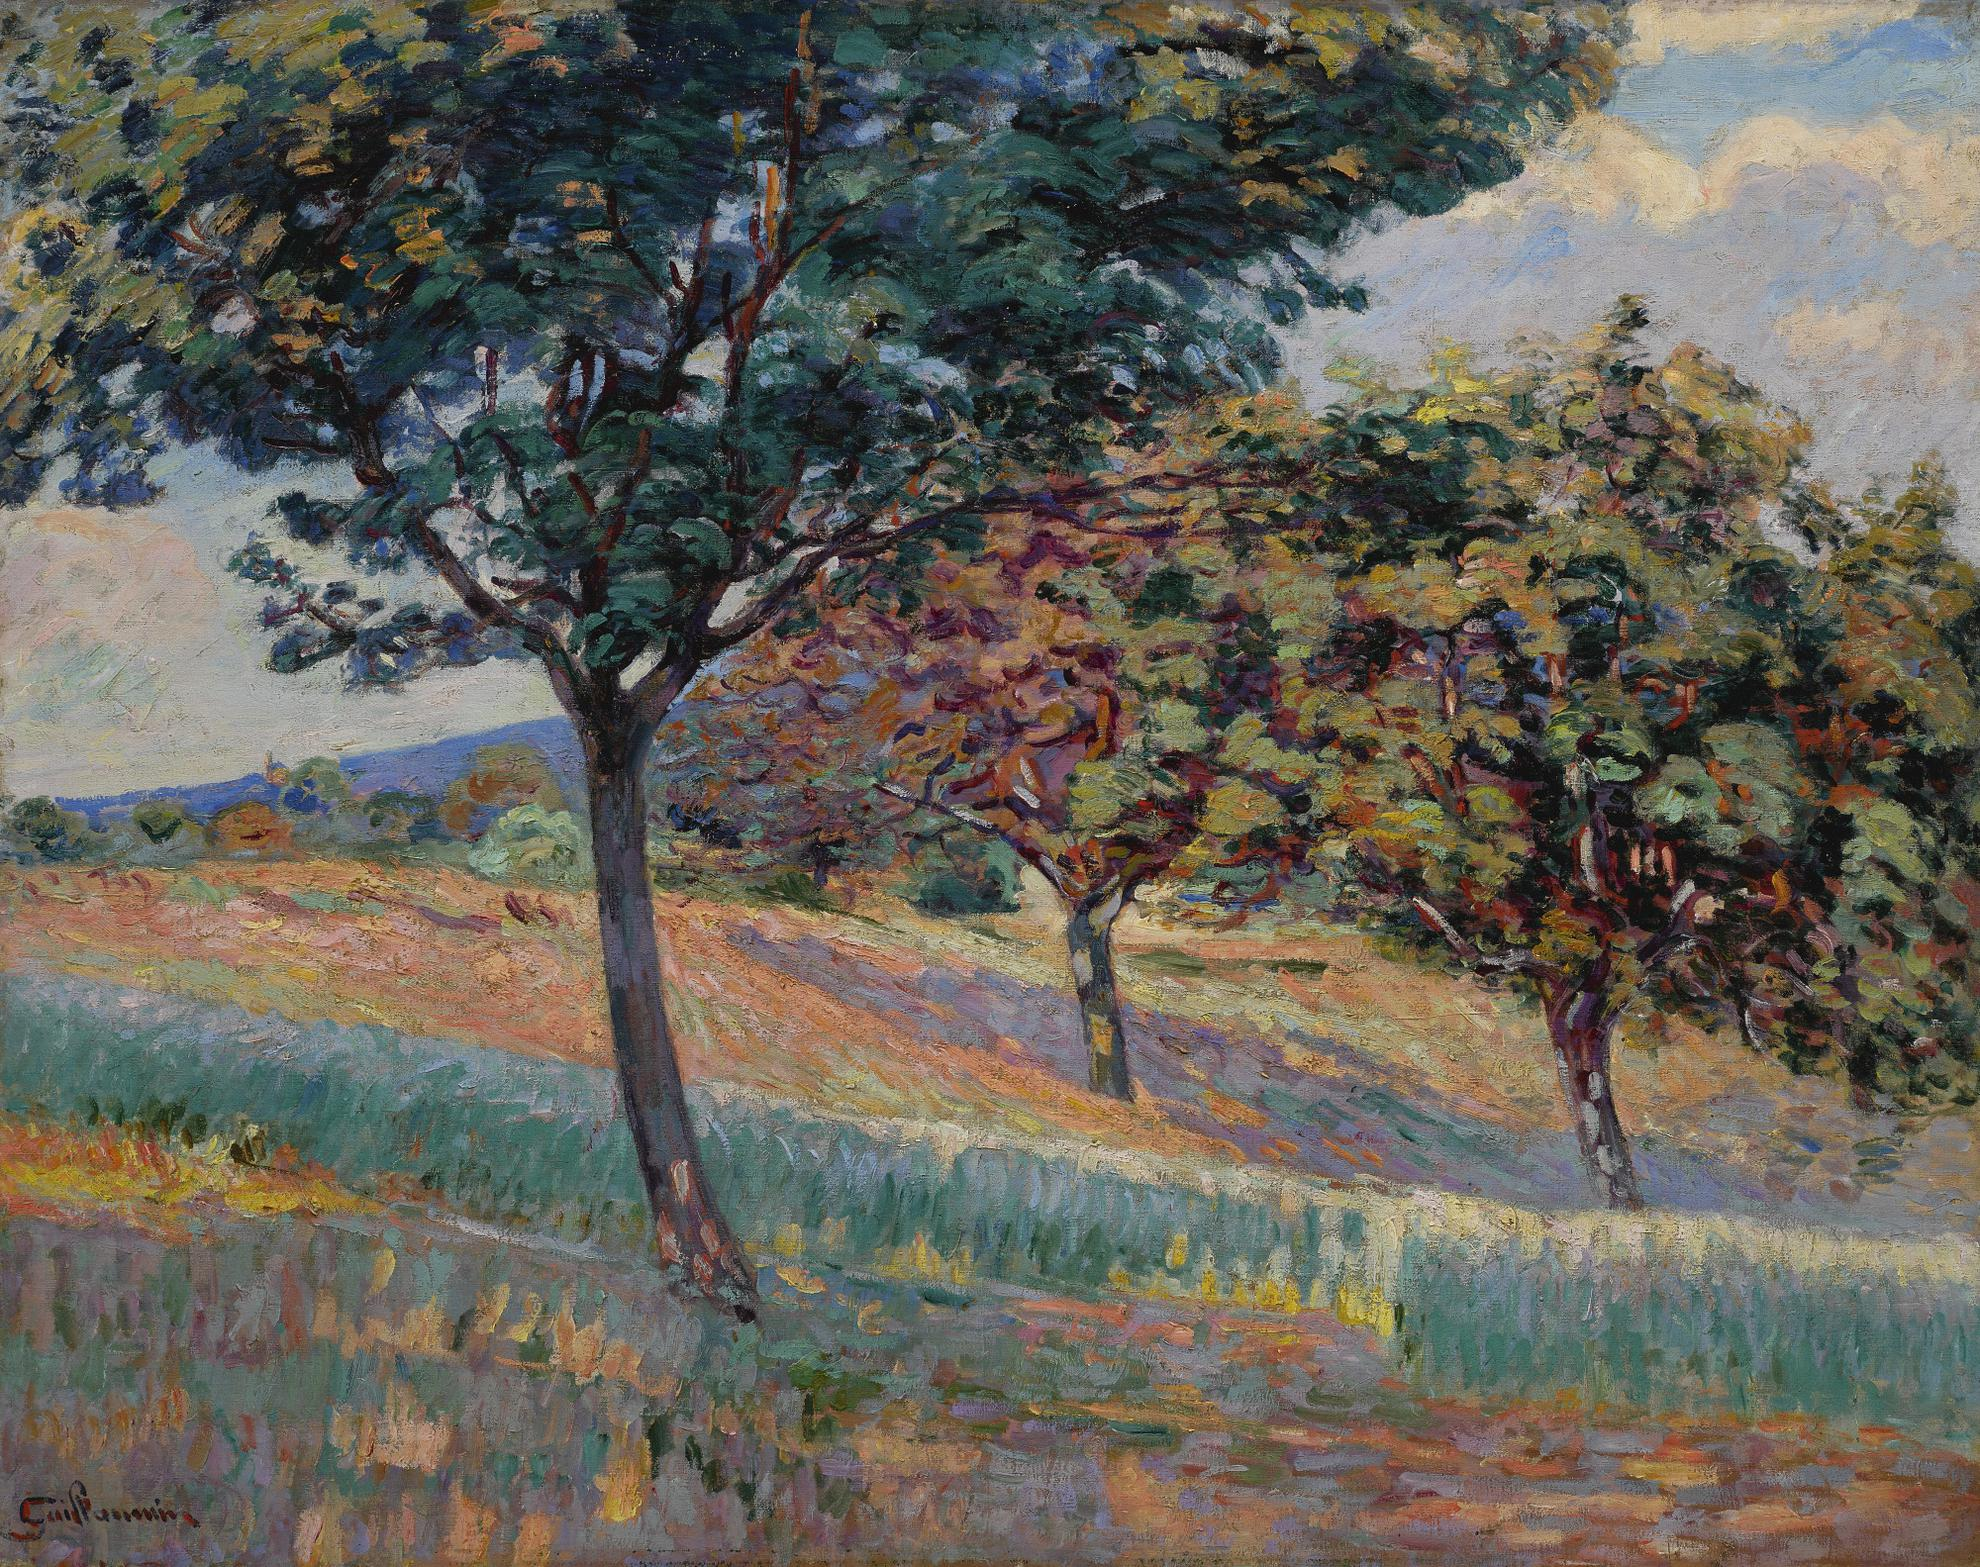 Jean-Baptiste Armand Guillaumin-Verger A La Lisiere Dun Bois A Saint-Cheron-1893